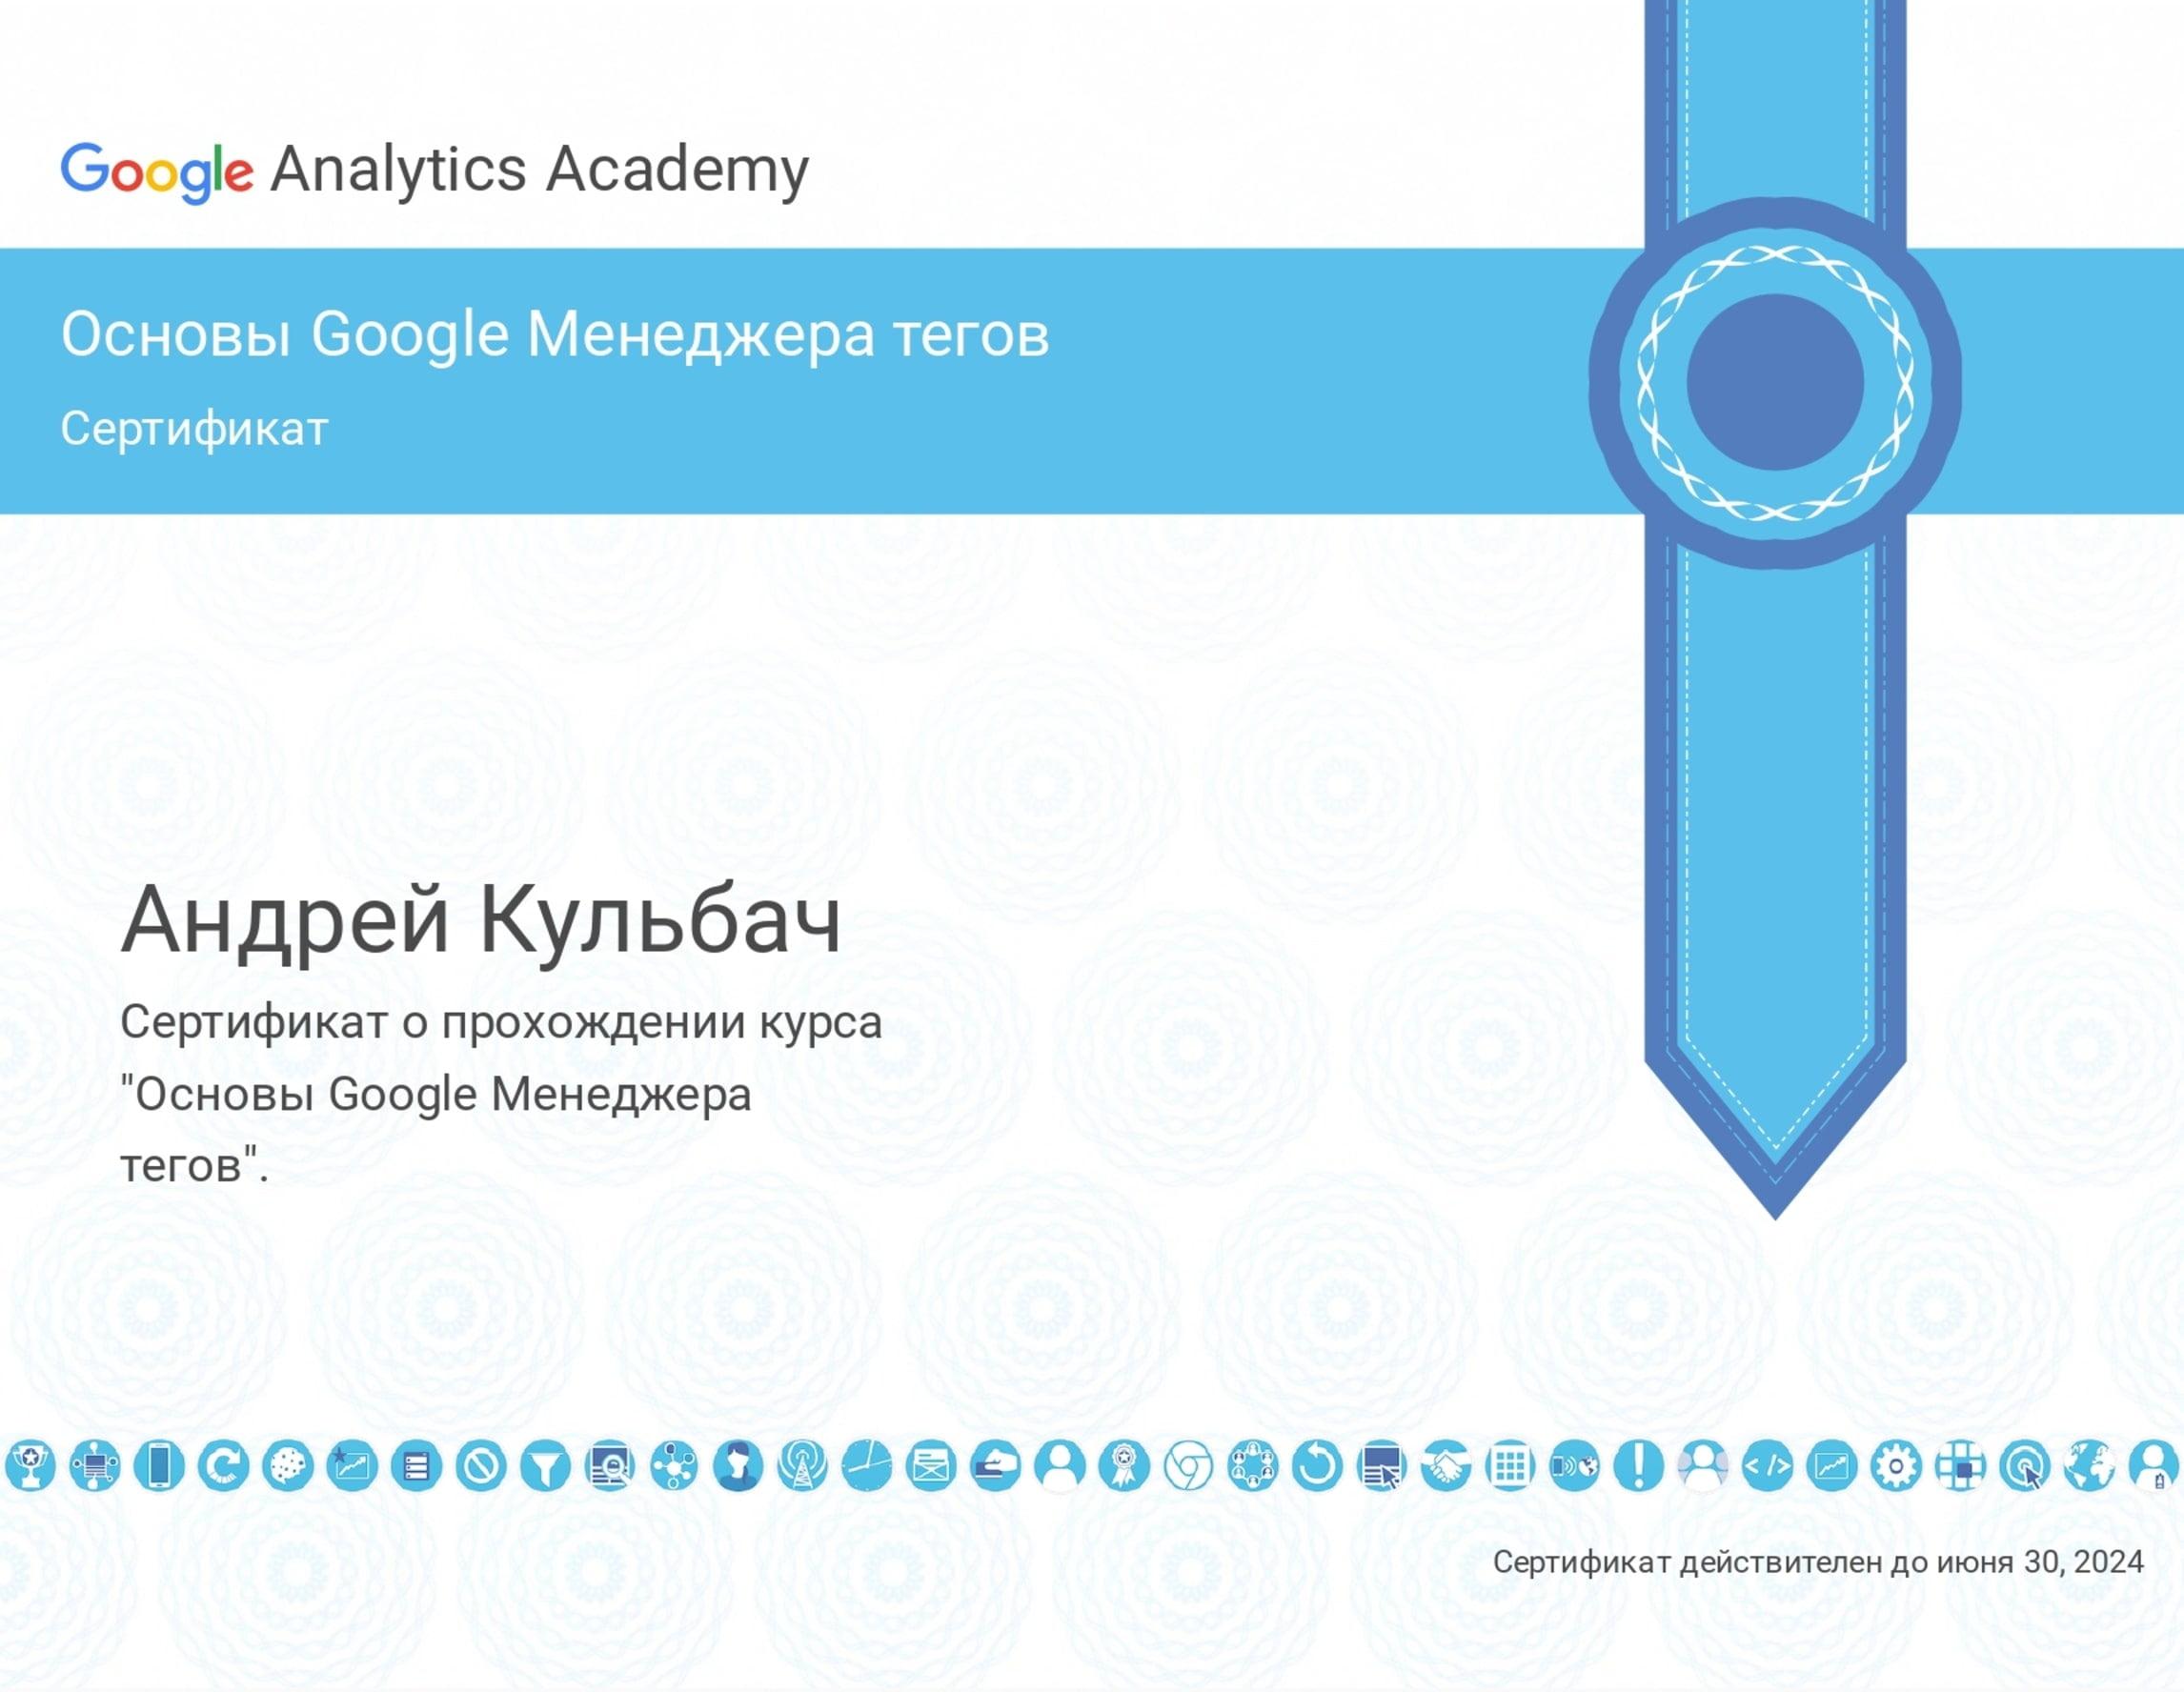 Андрей Кульбач - сертификат